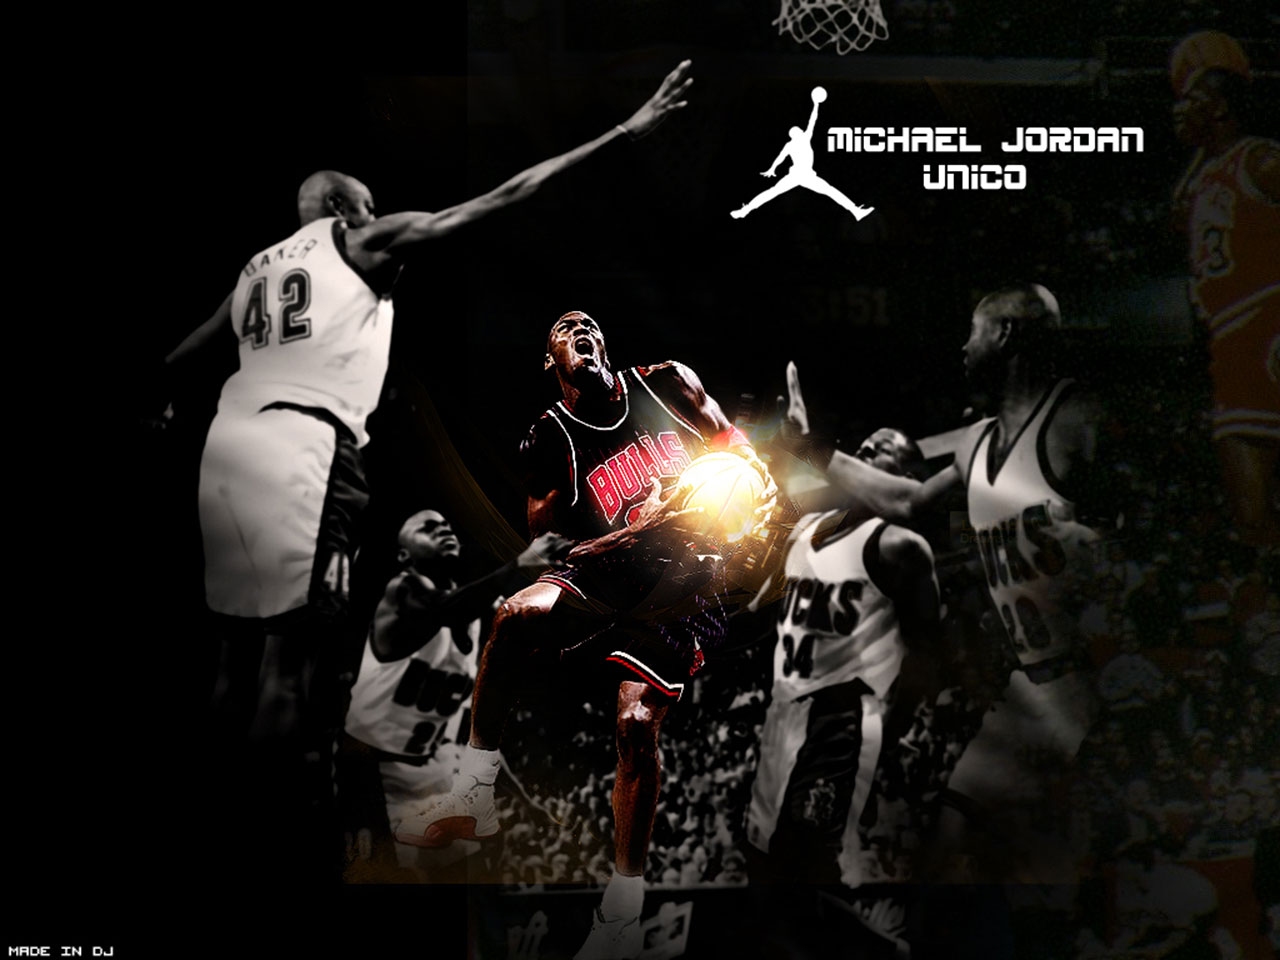 Download Cool Michael Jordan Wallpapers Gallery 1280x960